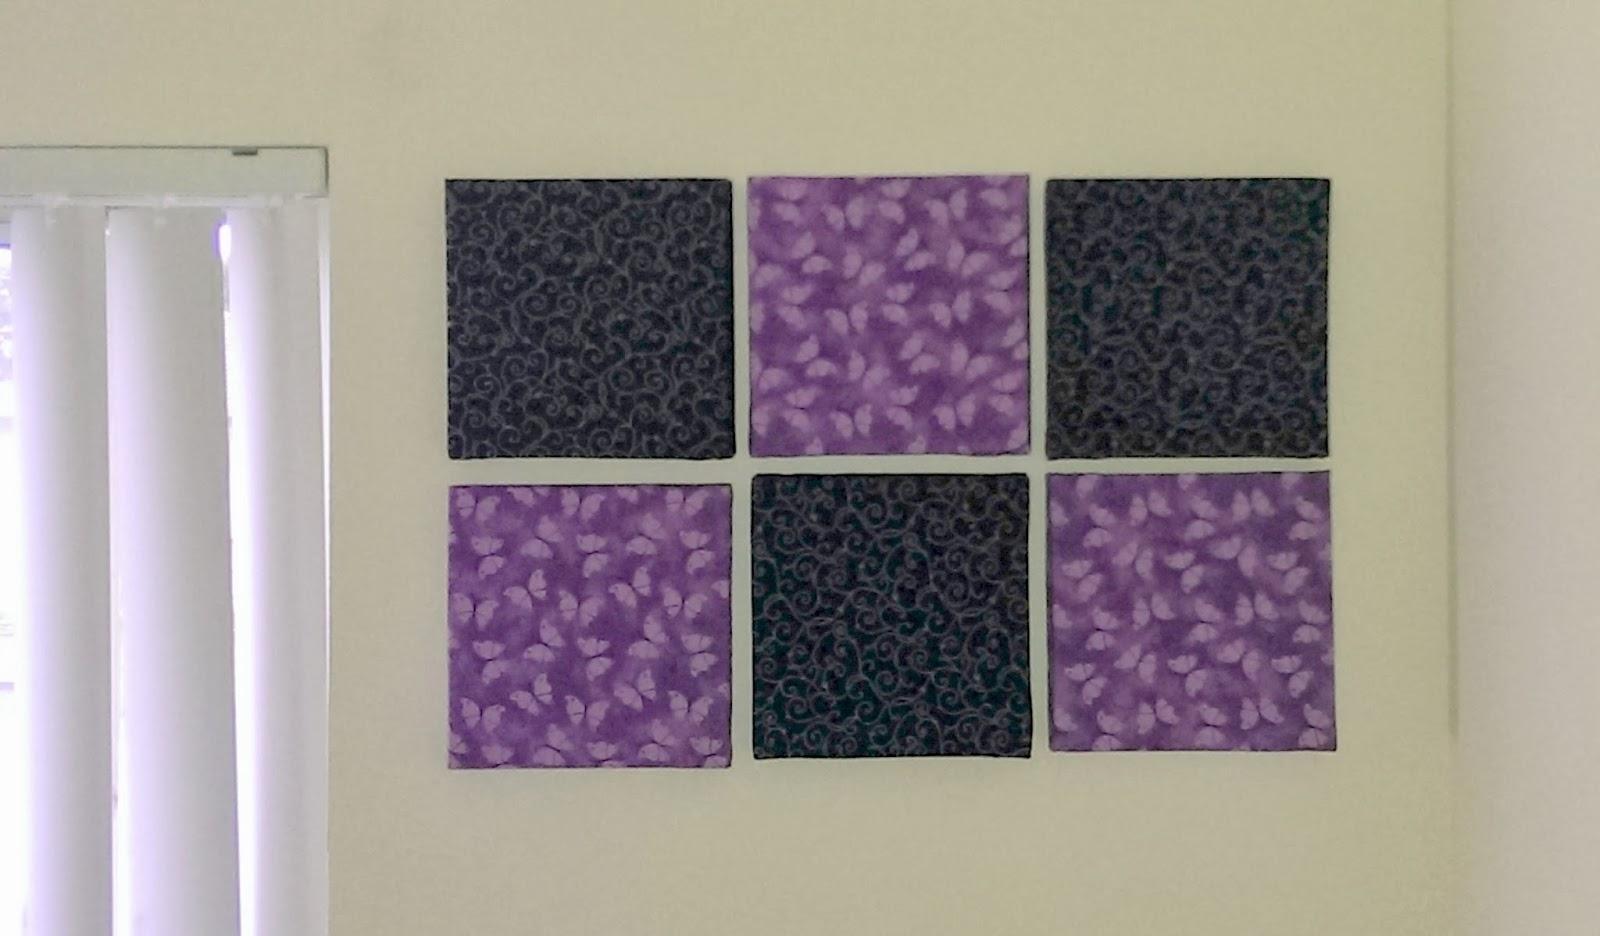 Diy Addiction: Wall Art – Fabric Covered Canvas Regarding Recent Fabric Covered Wall Art (View 9 of 15)